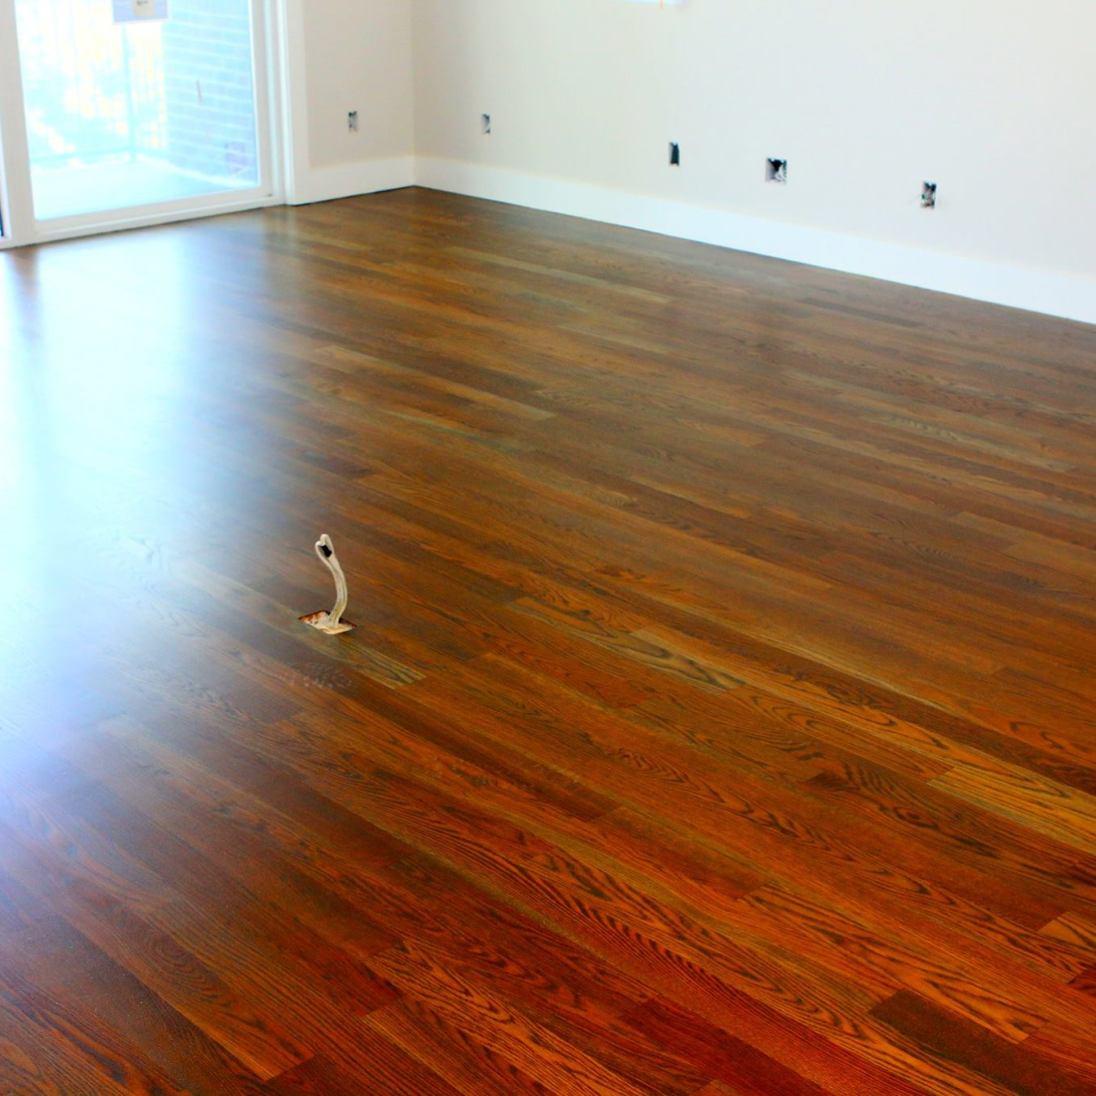 Traverse-City-Hardwood-Floors-White-Oak-Grey-Stain-Randolf-Condo-01